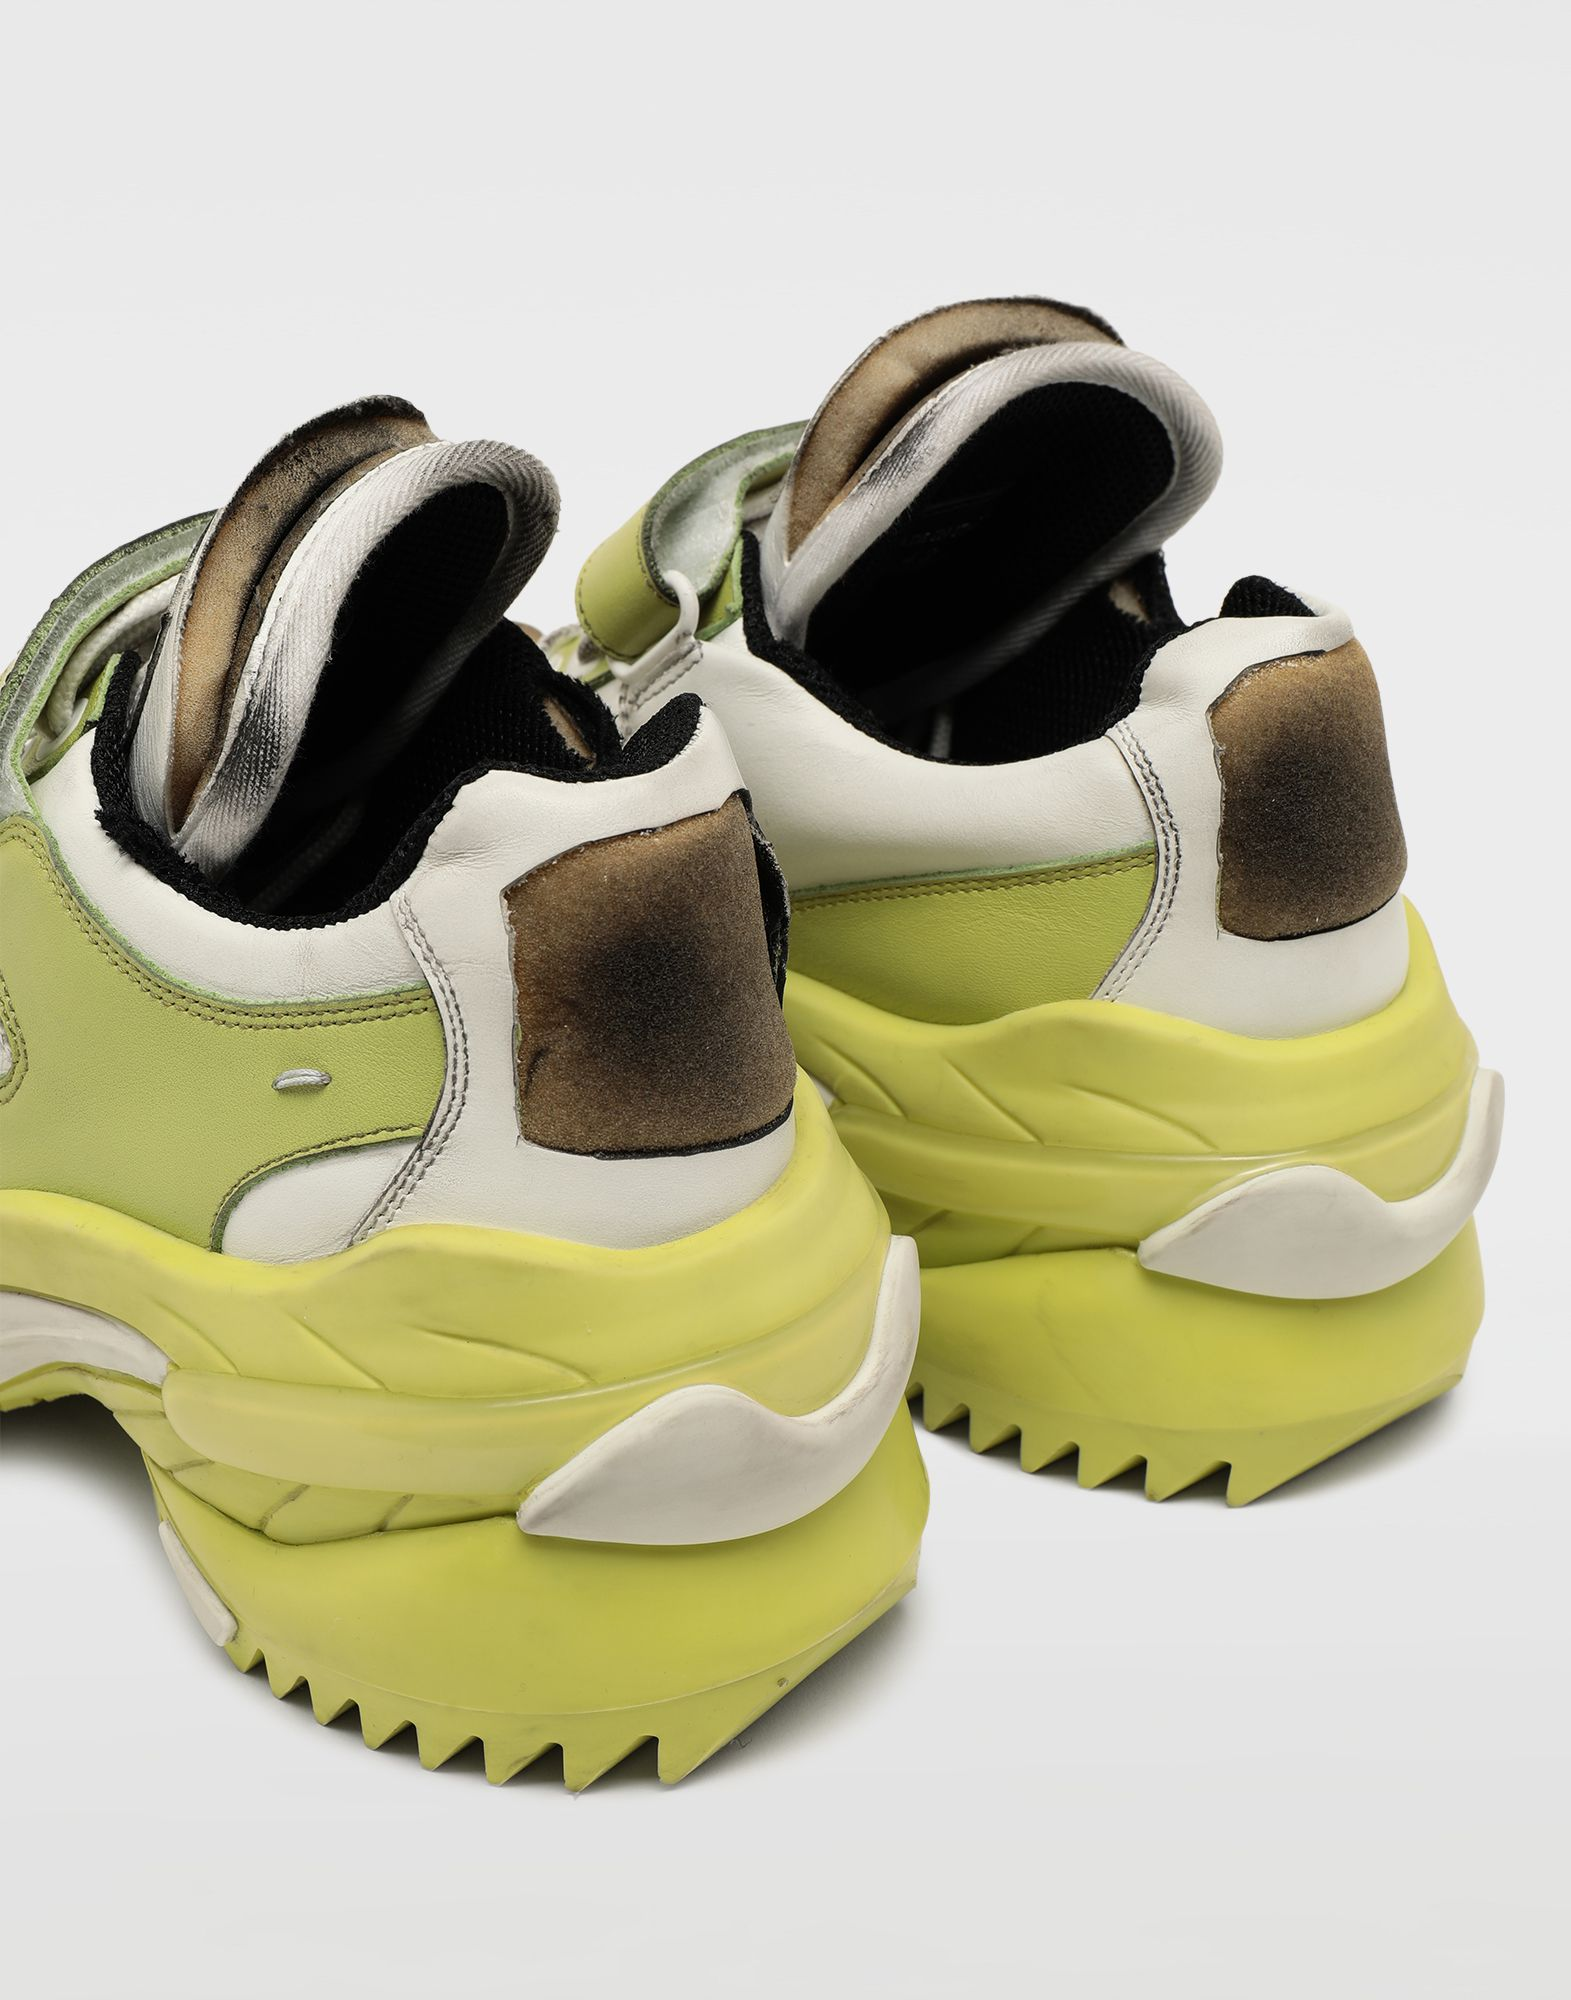 MAISON MARGIELA Low-Top-Sneakers Retro Fit Sneakers Herren a